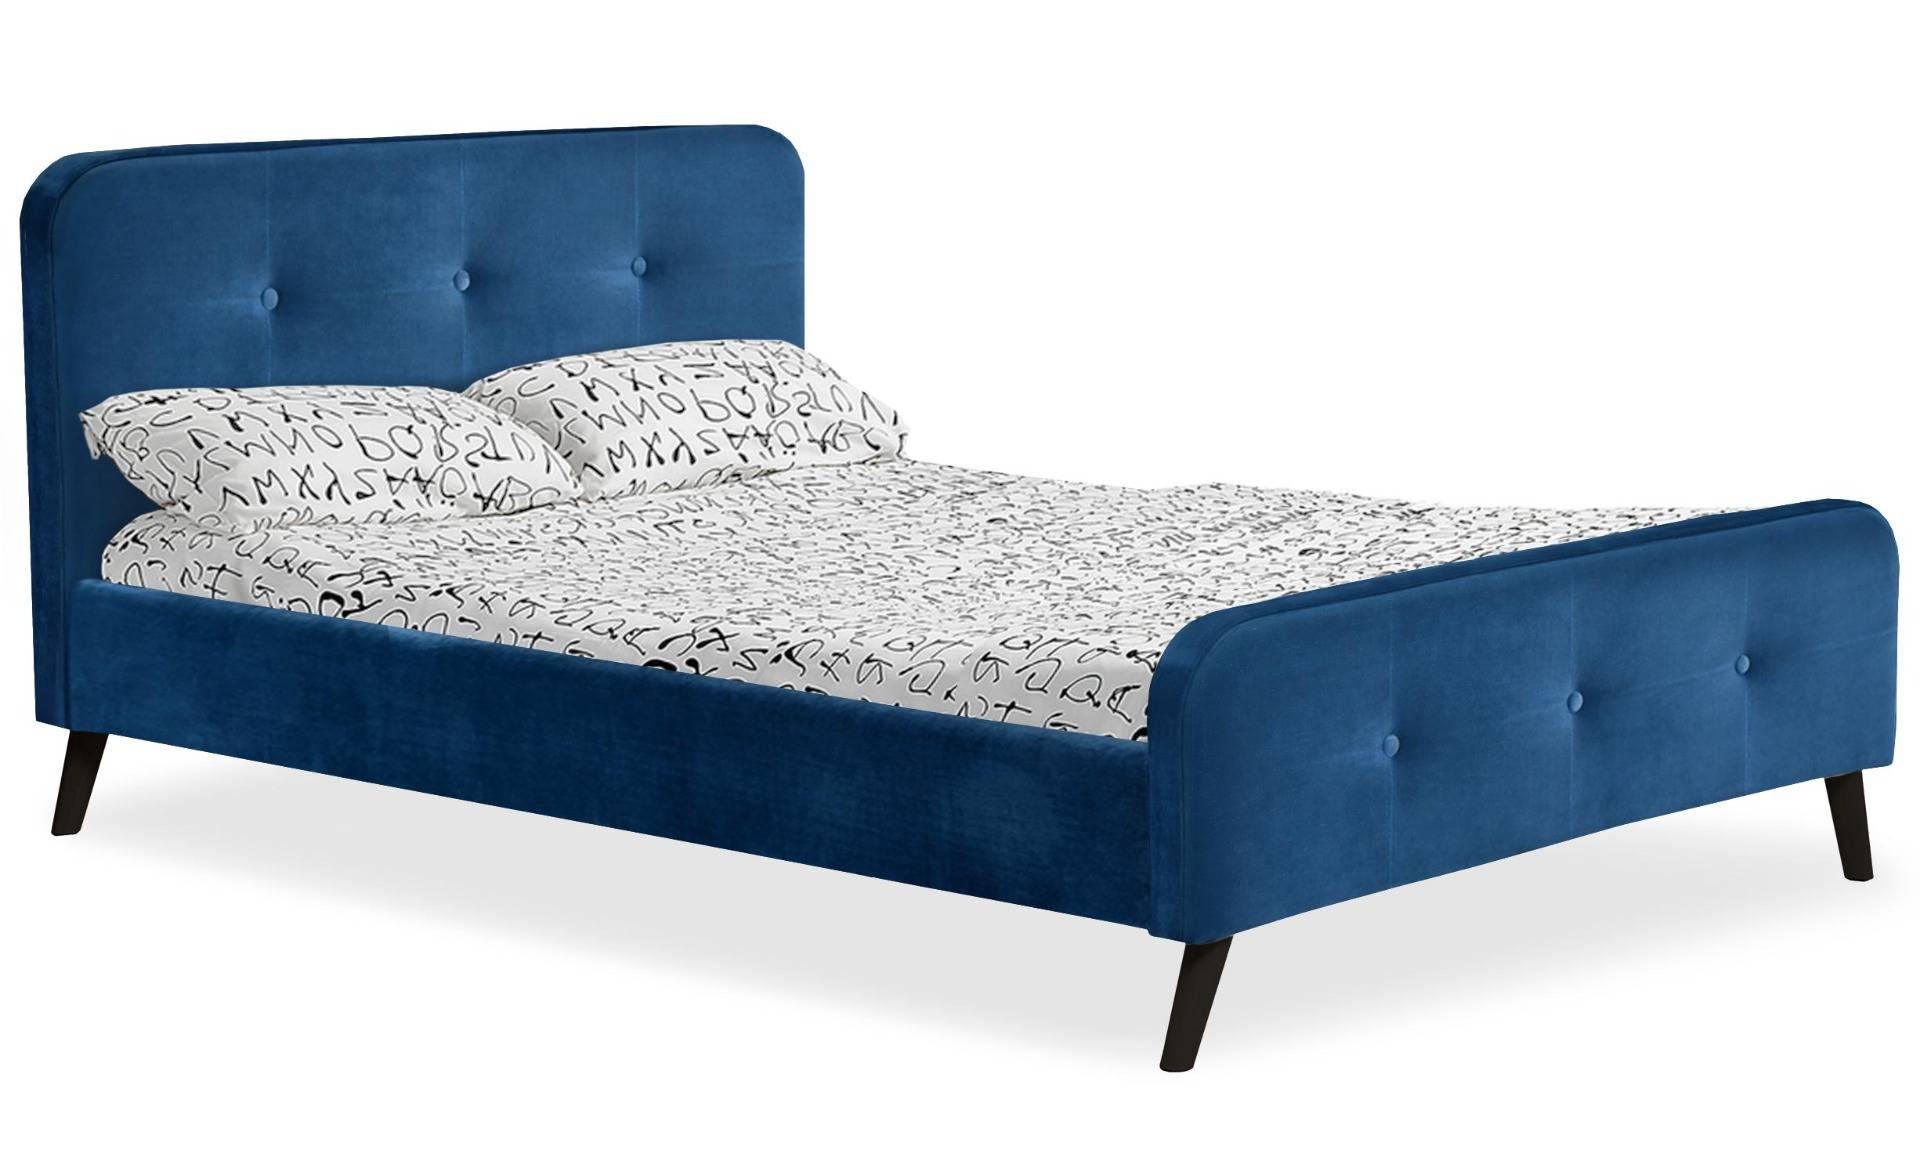 MENZZO Lit scandinave avec tête de lit et sommier 140x190cm Delano Velours Bleu